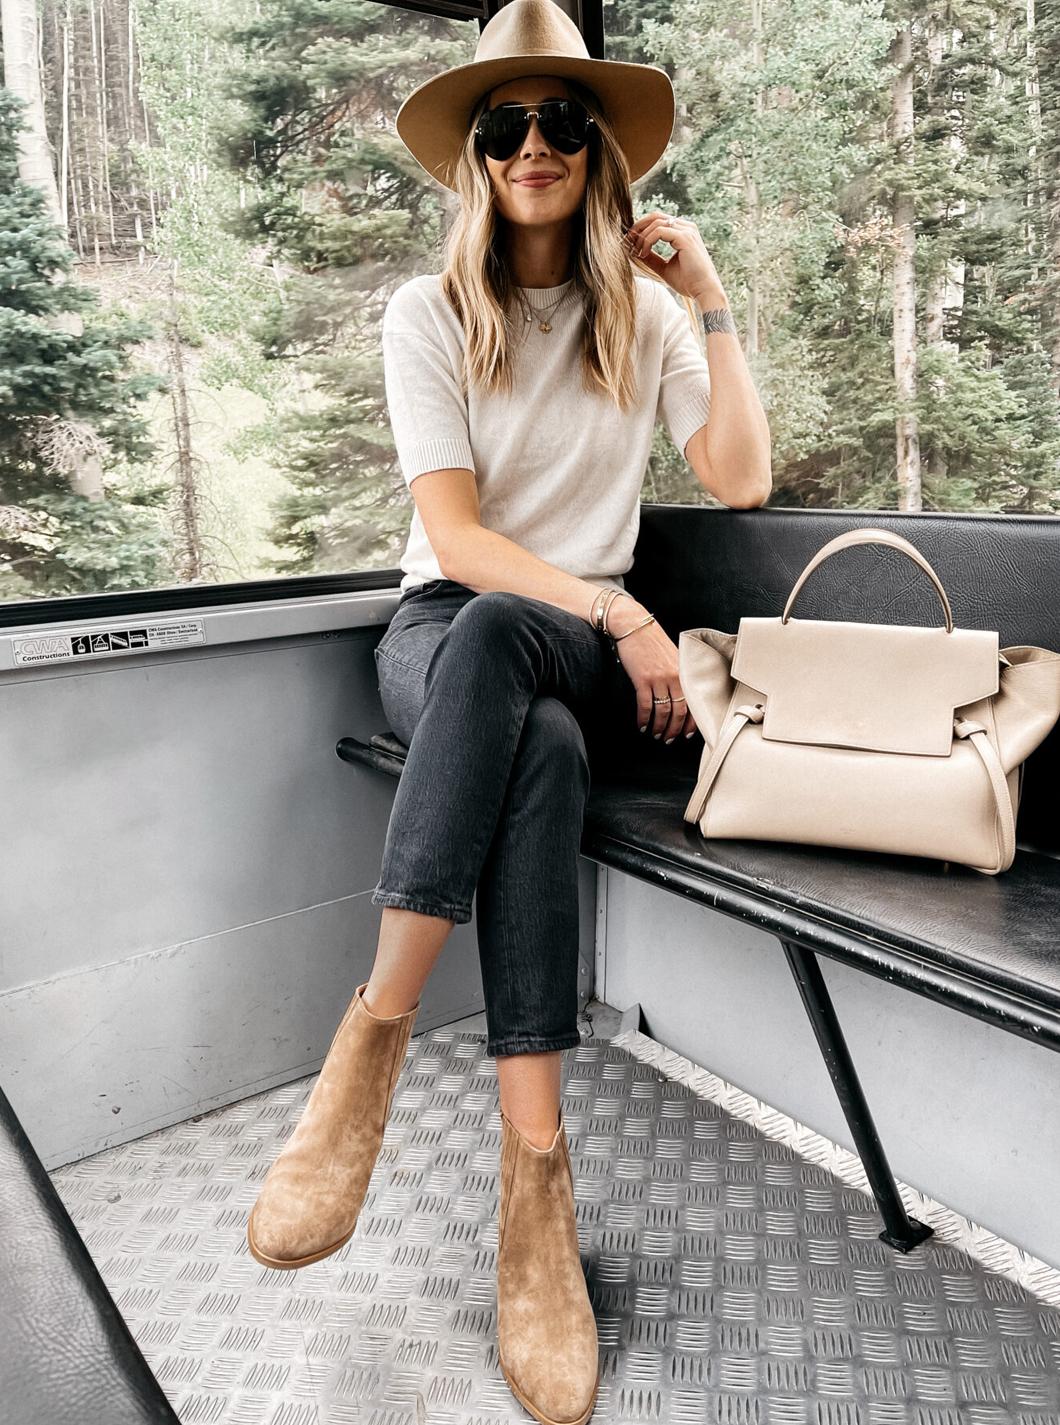 Fashion-Jackson-Wearing-Tan-Wool-Hat-White-Short-Sleeve-Sweater-Black-Jeans-Tan-Suede-Booties-Celine-Mini-Belt-Bag-1440x1800